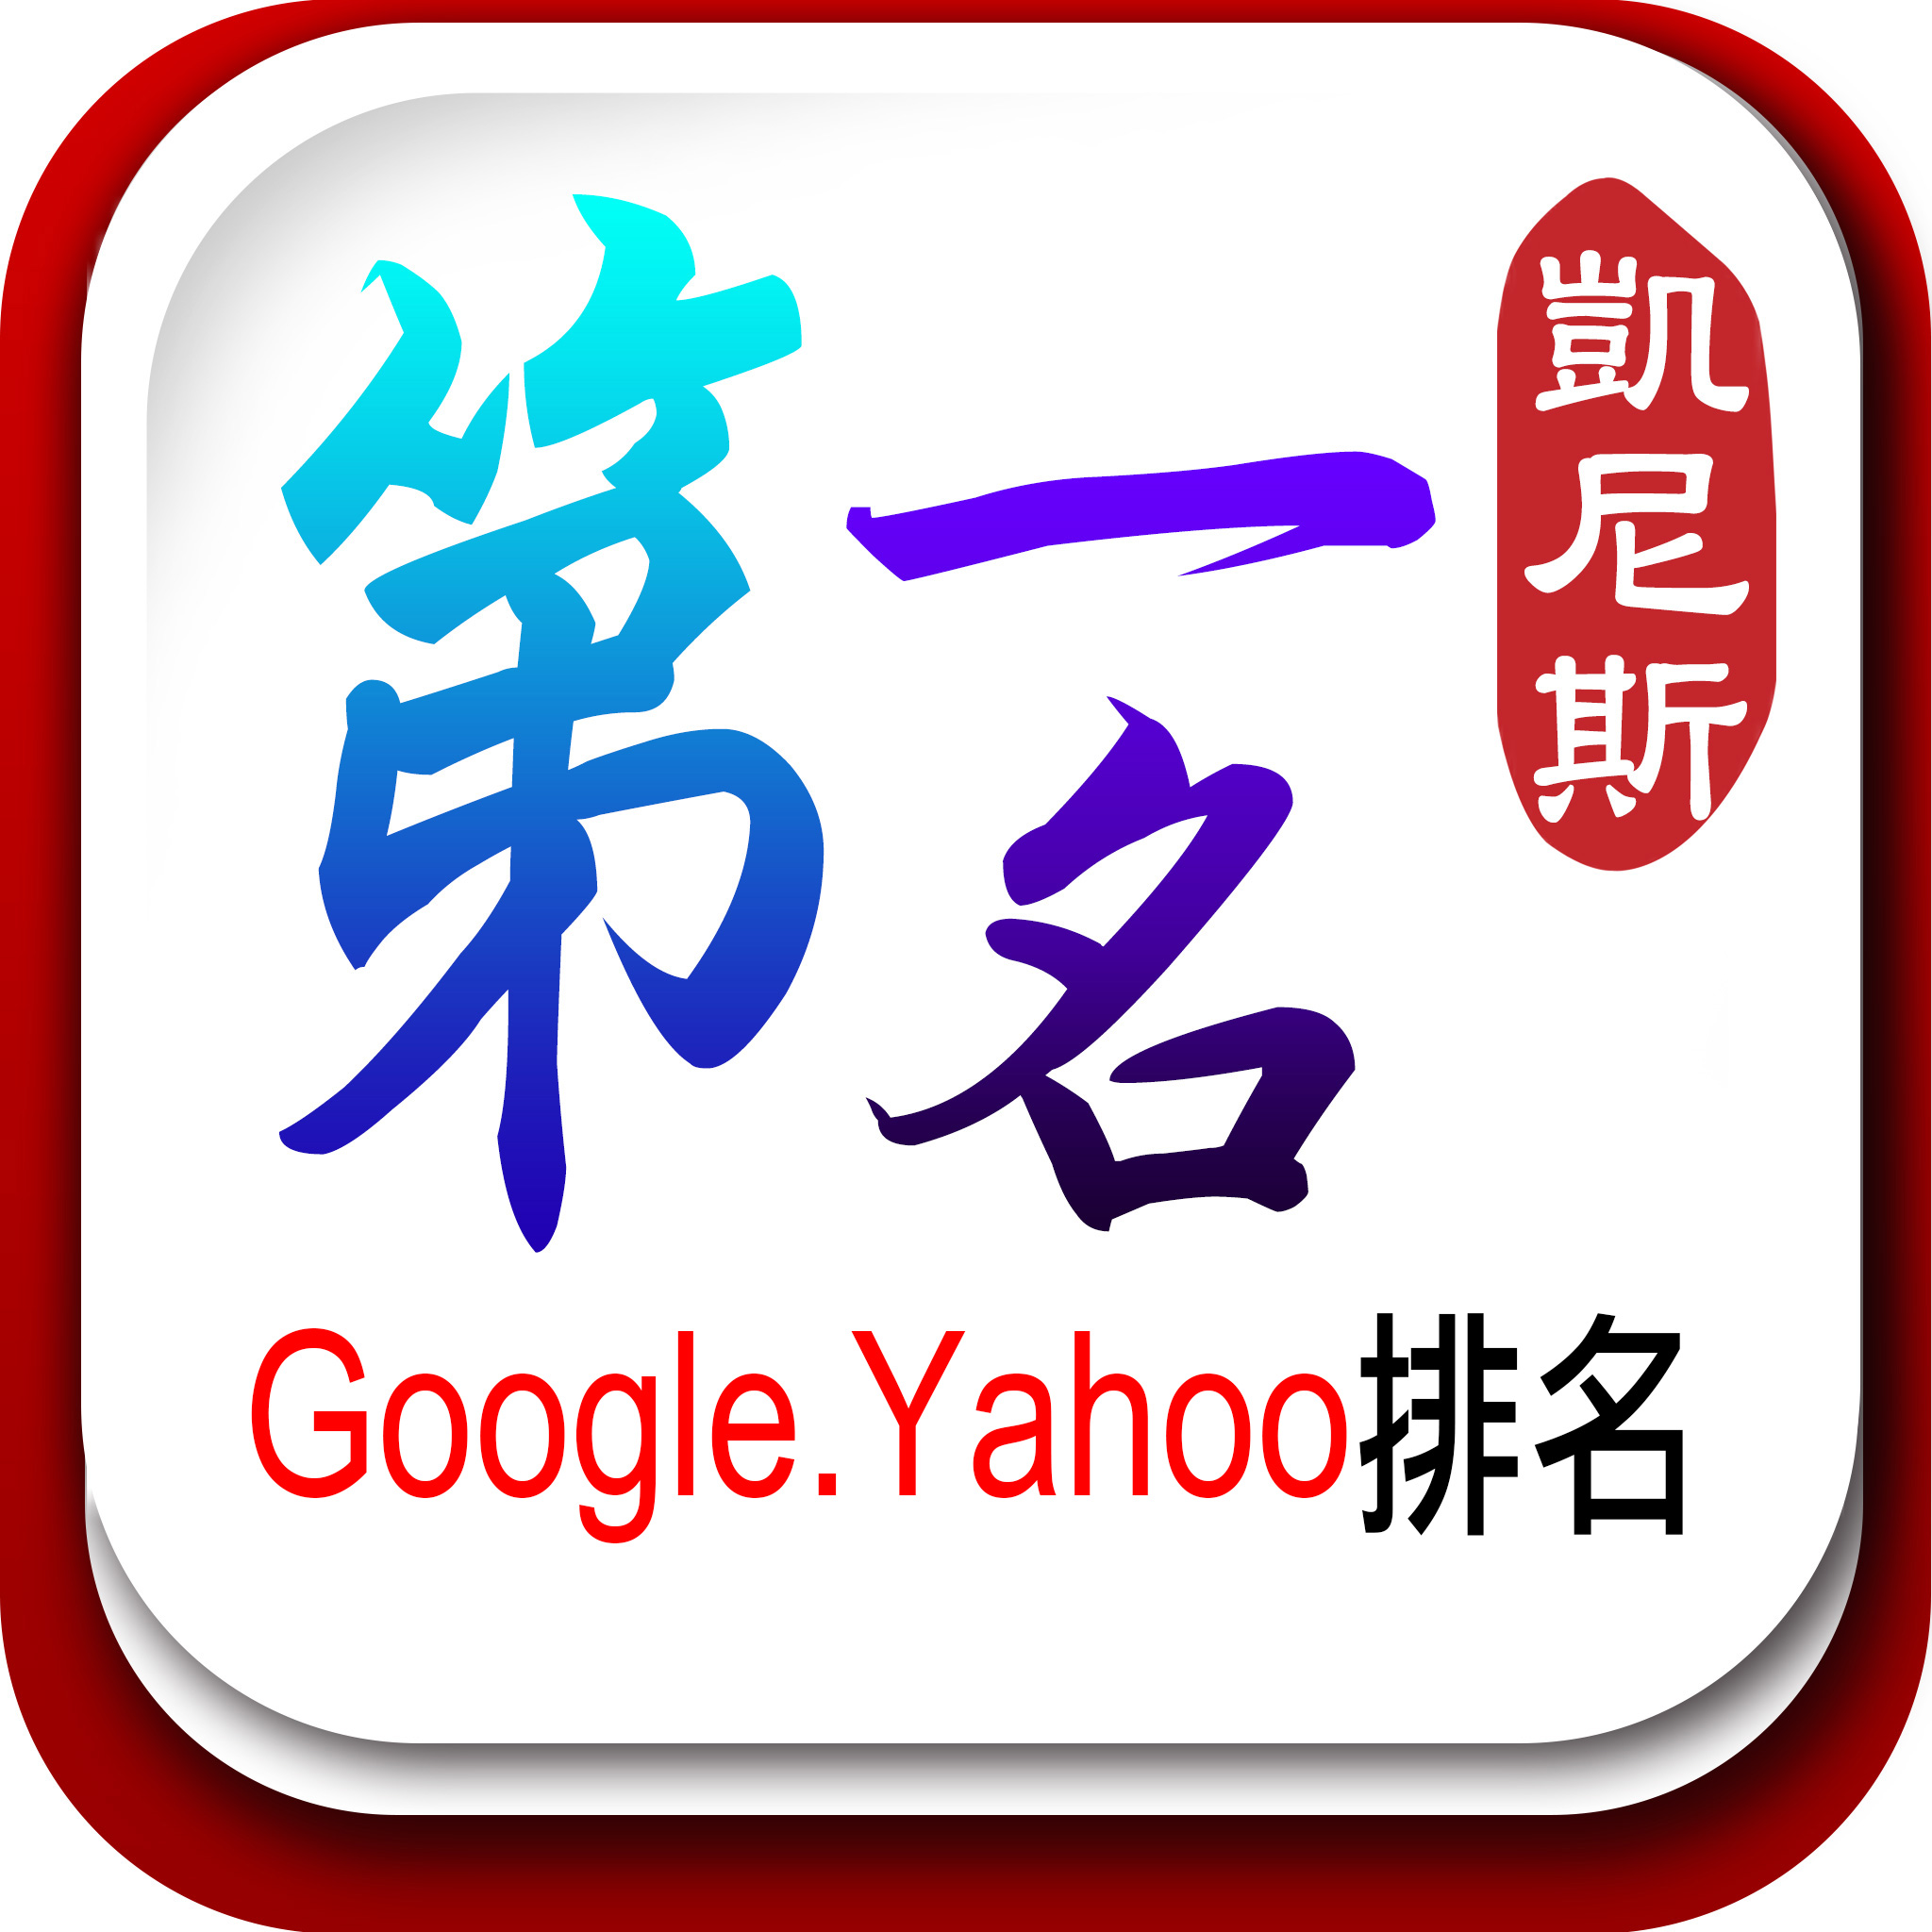 Google關鍵字排名第一名